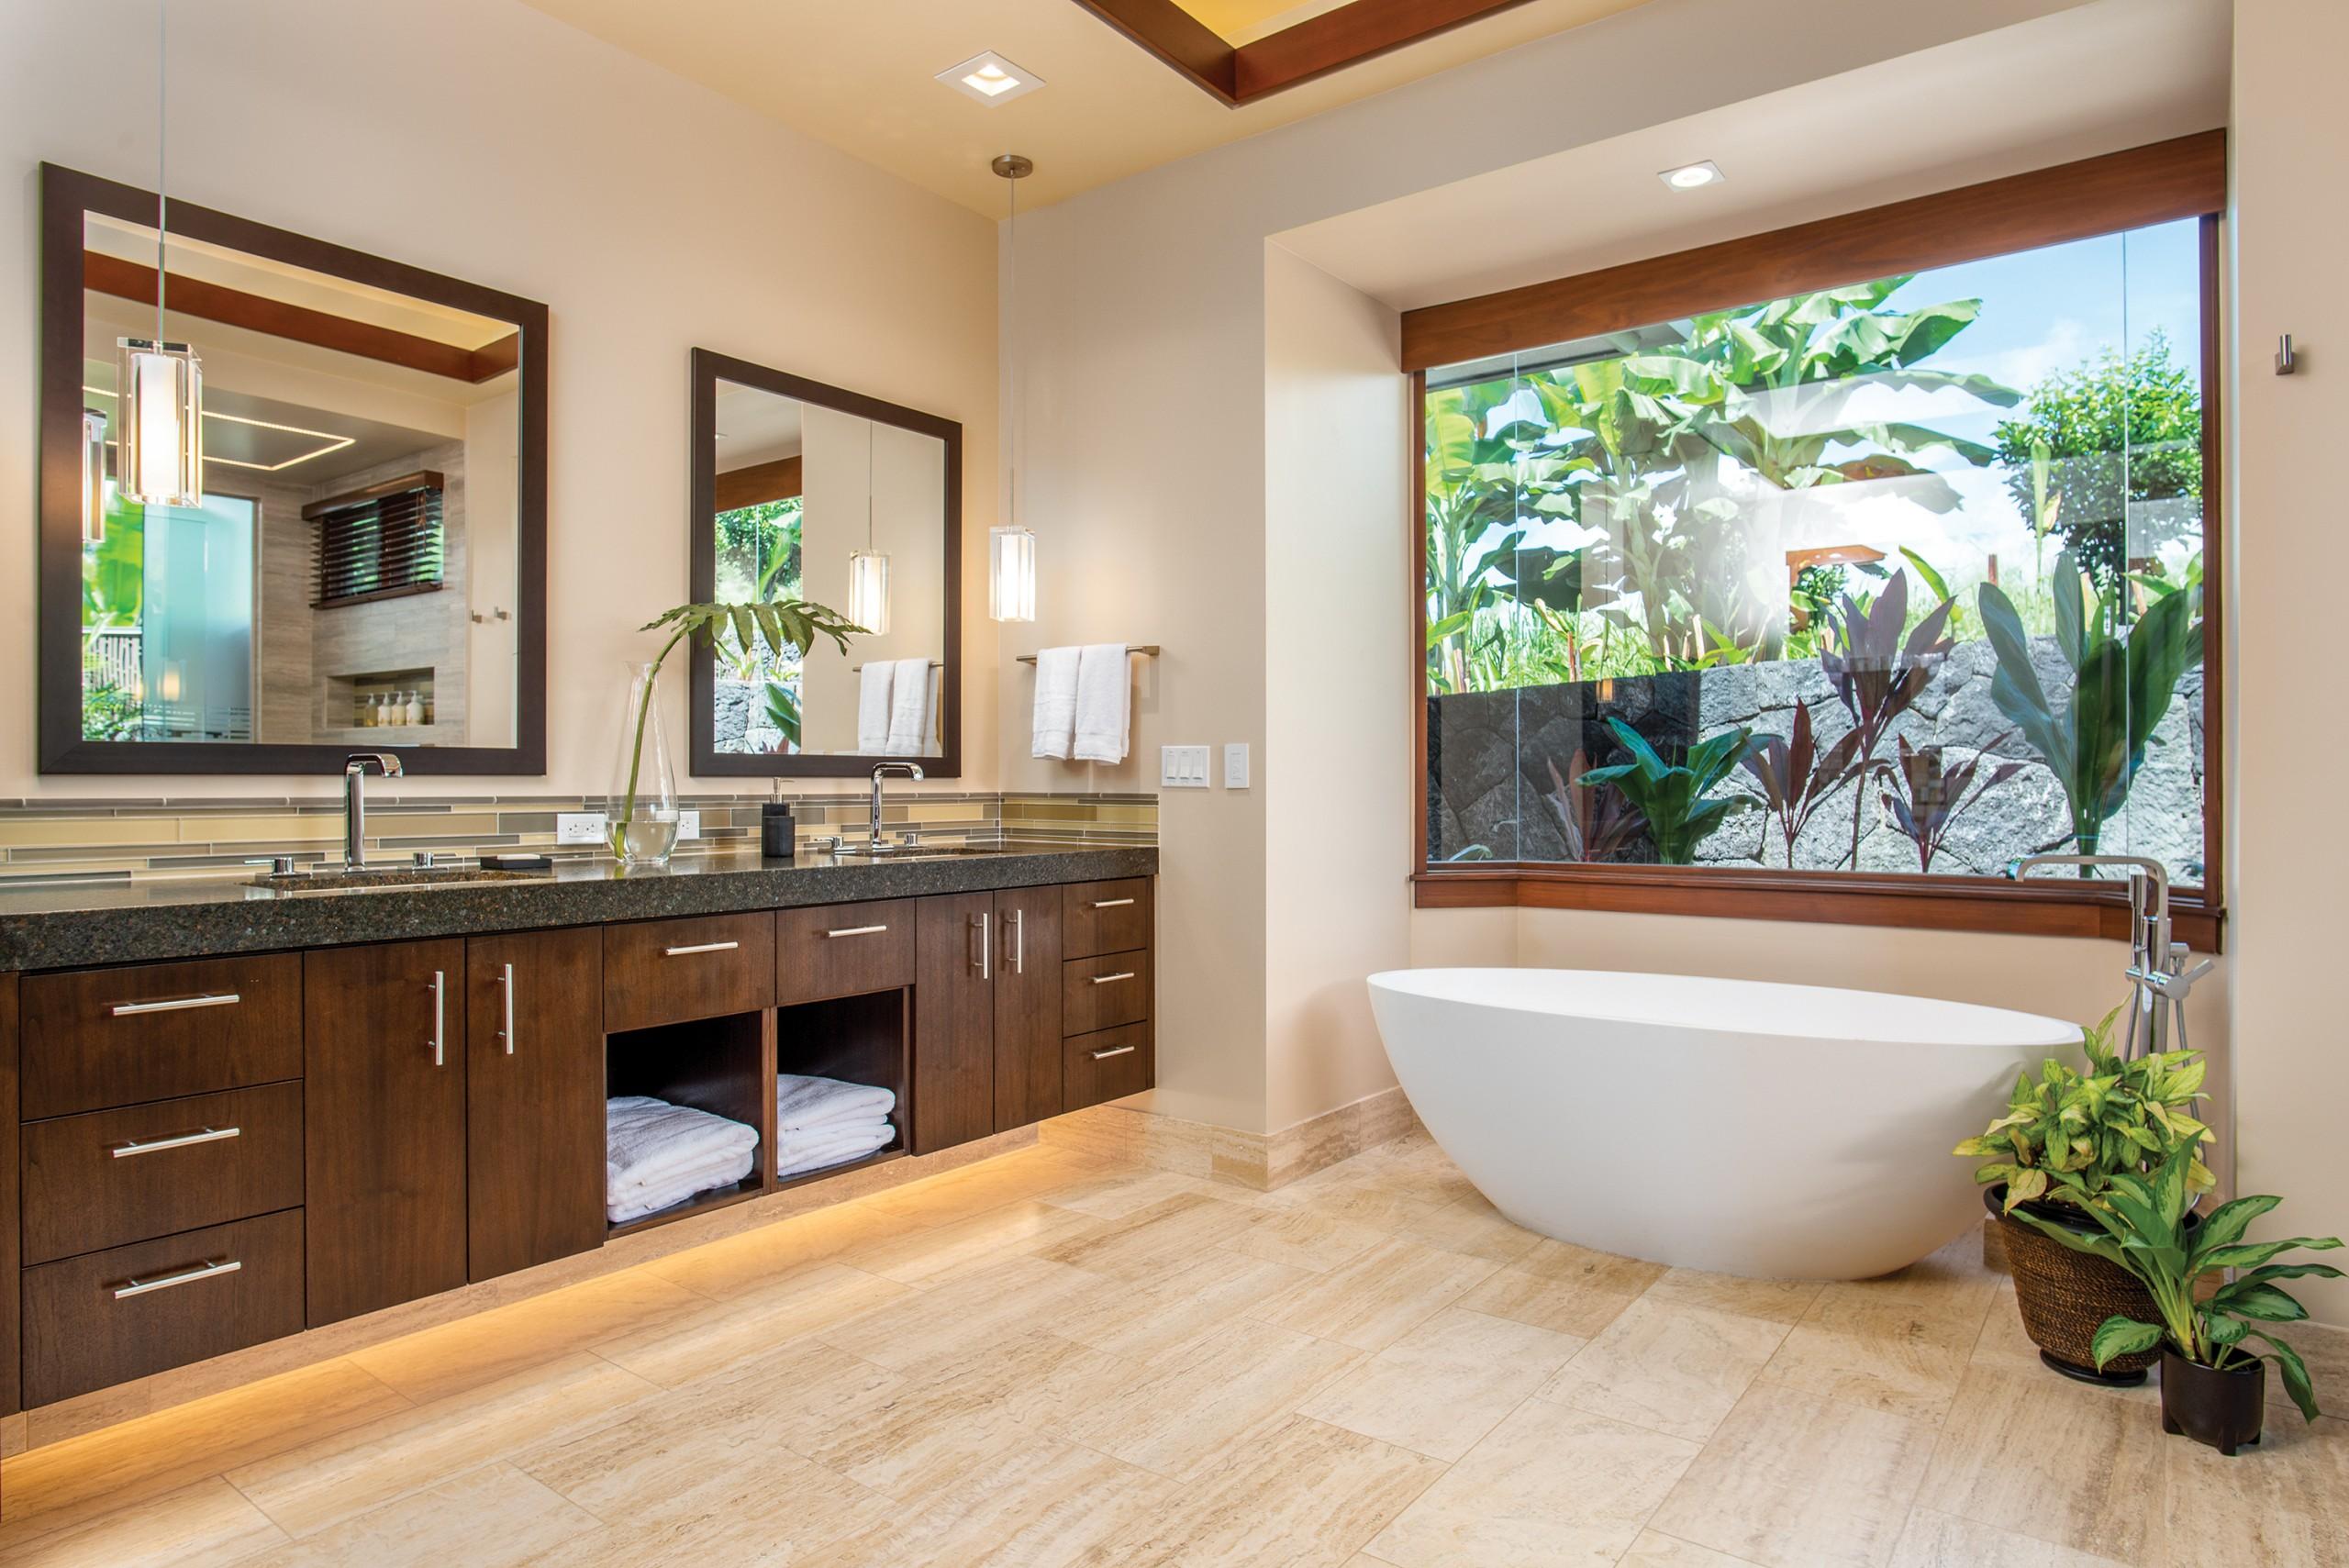 6 Trans Pacific Design Master Bathroom Pc James Lear